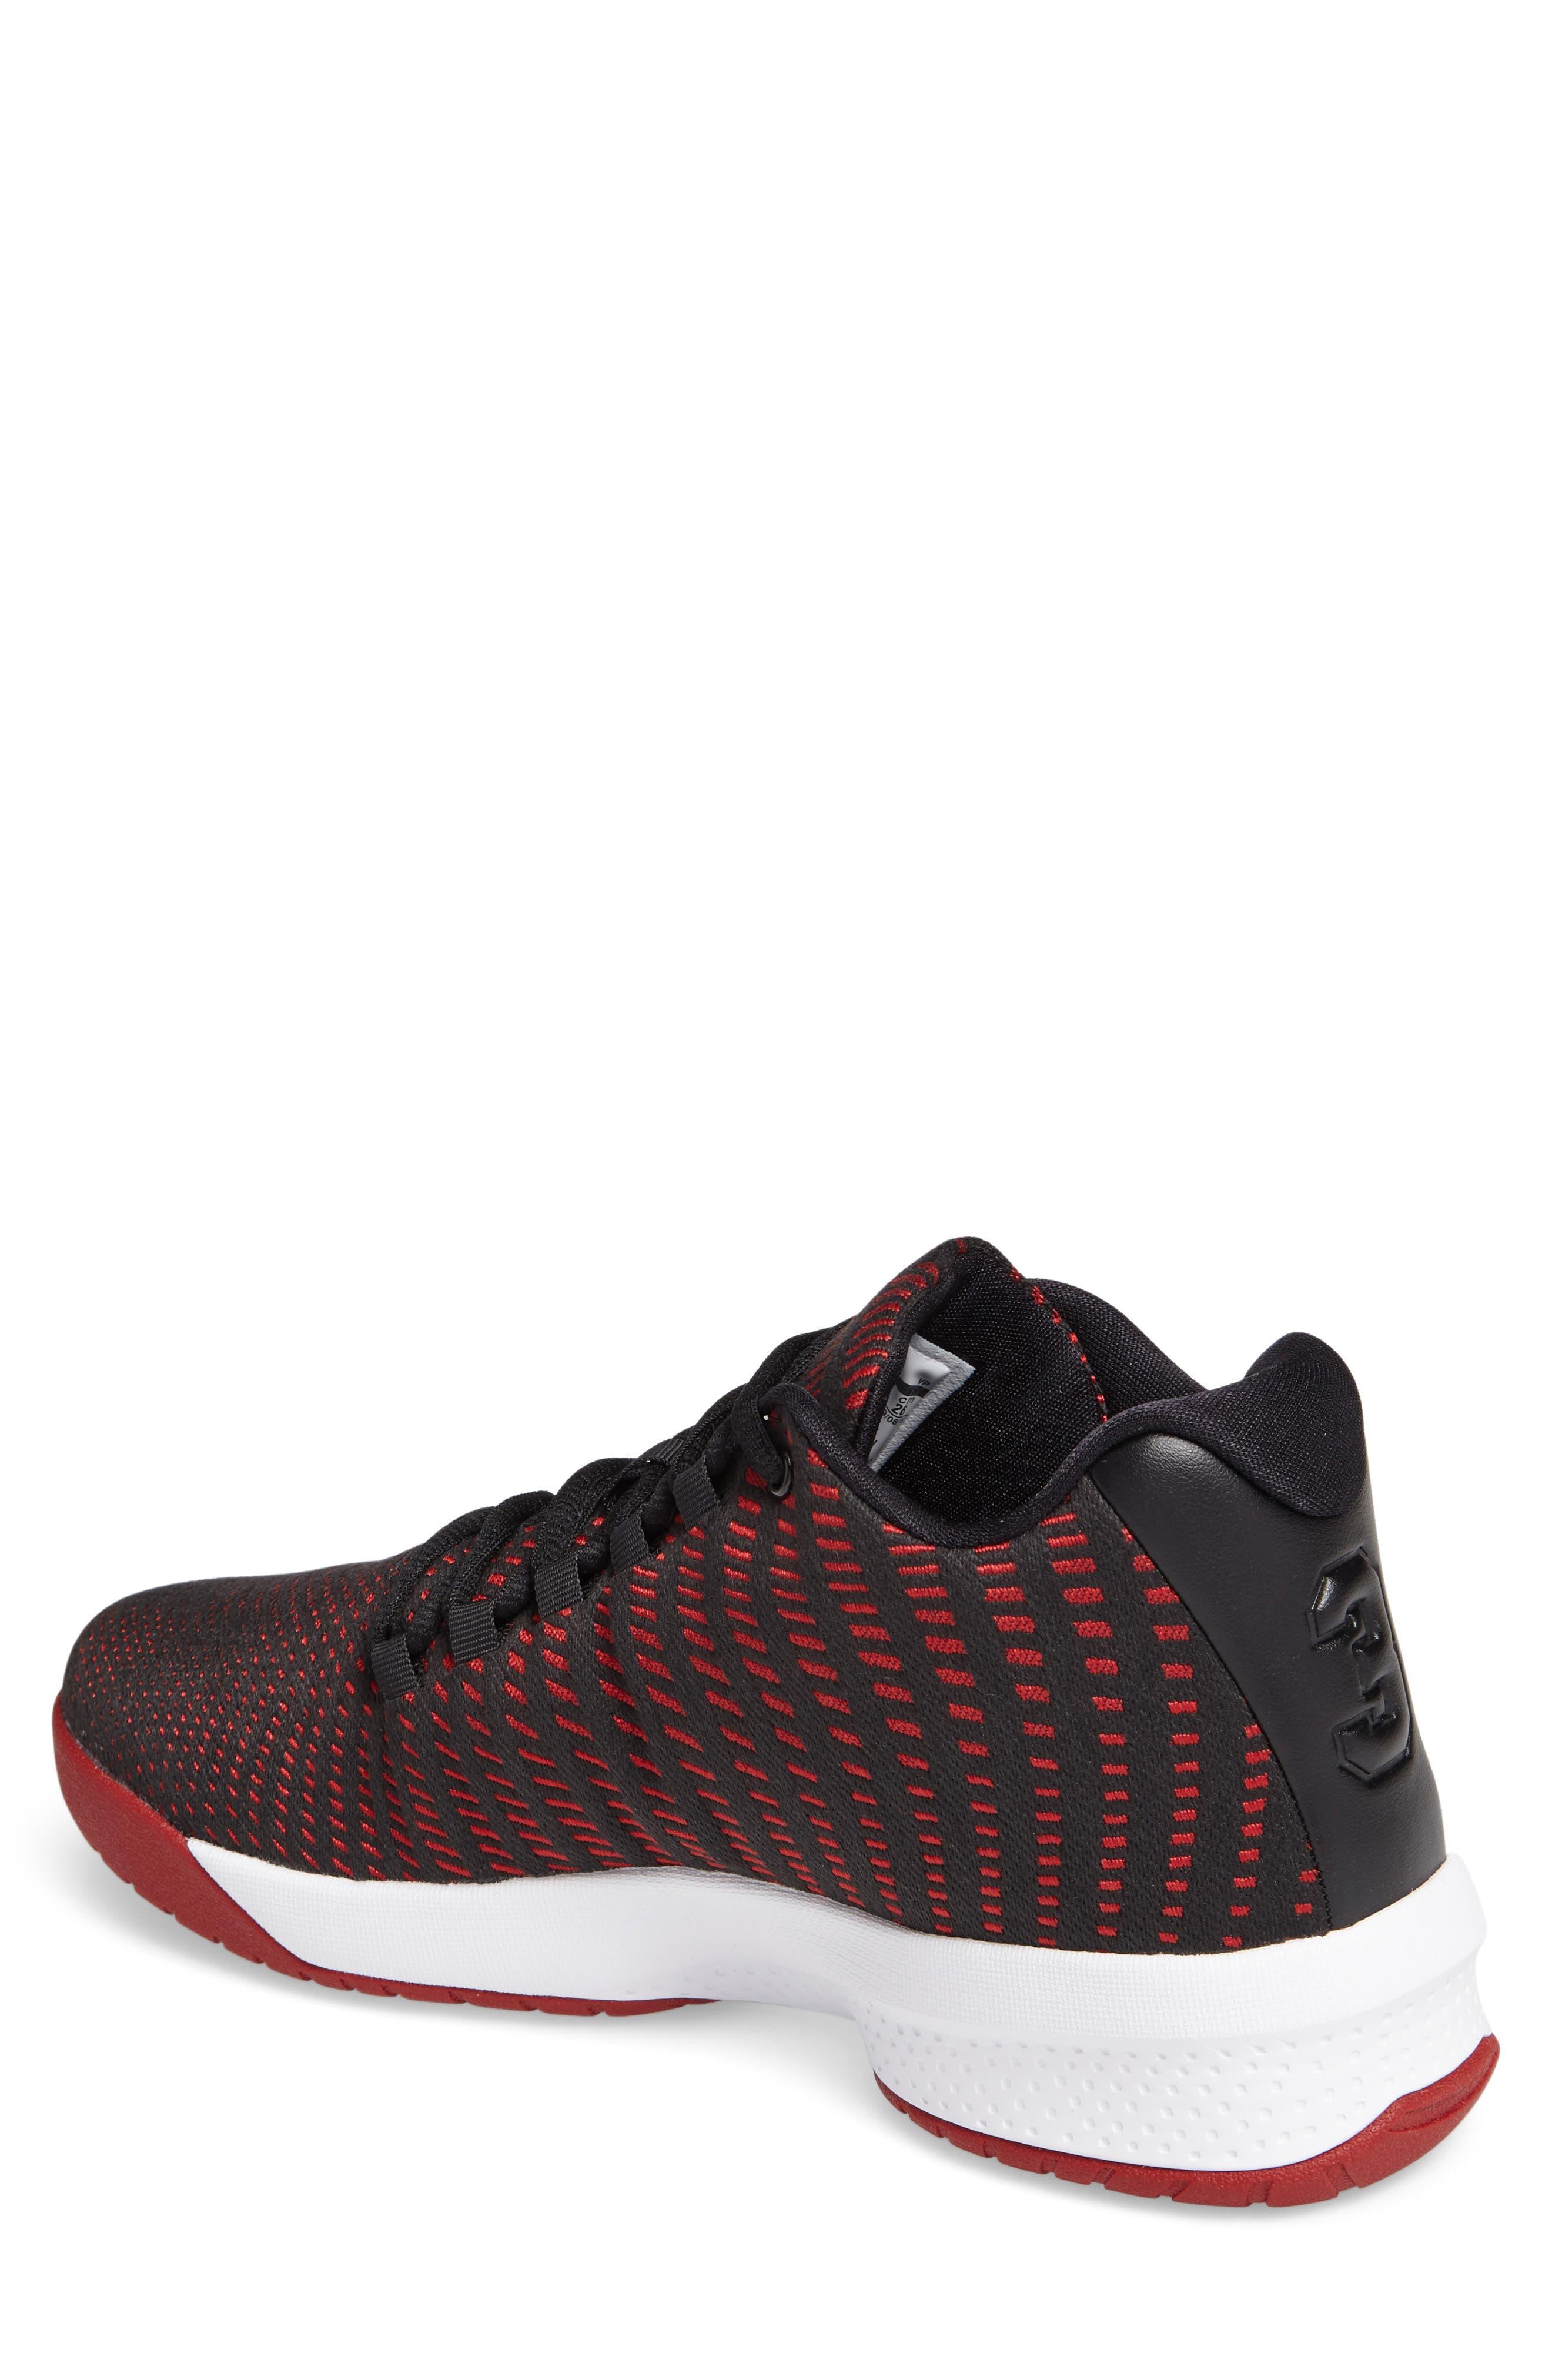 Jordan B. Fly Basketball Shoe,                             Alternate thumbnail 2, color,                             002